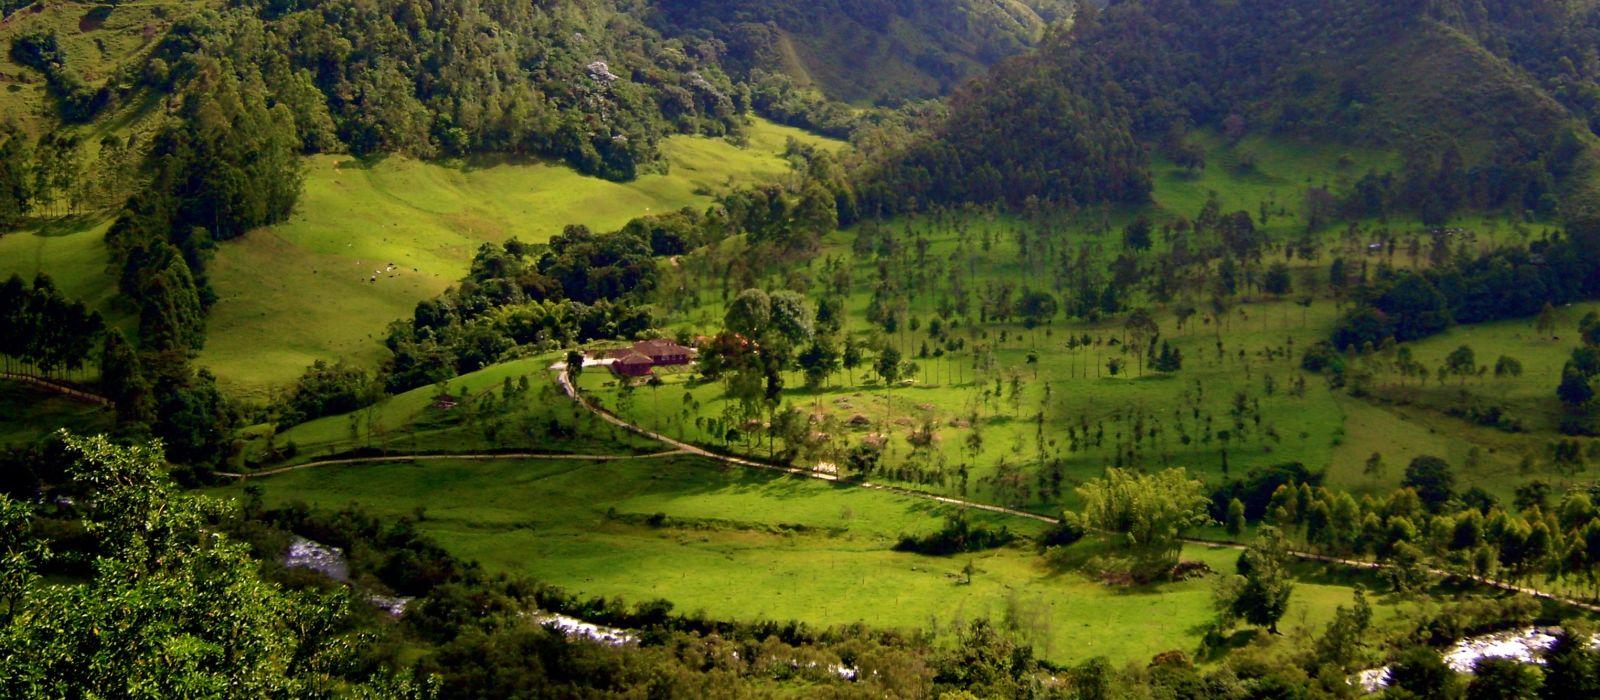 Kolumbien: Cartagena, Kaffeeregion & Isla Baru Urlaub 4